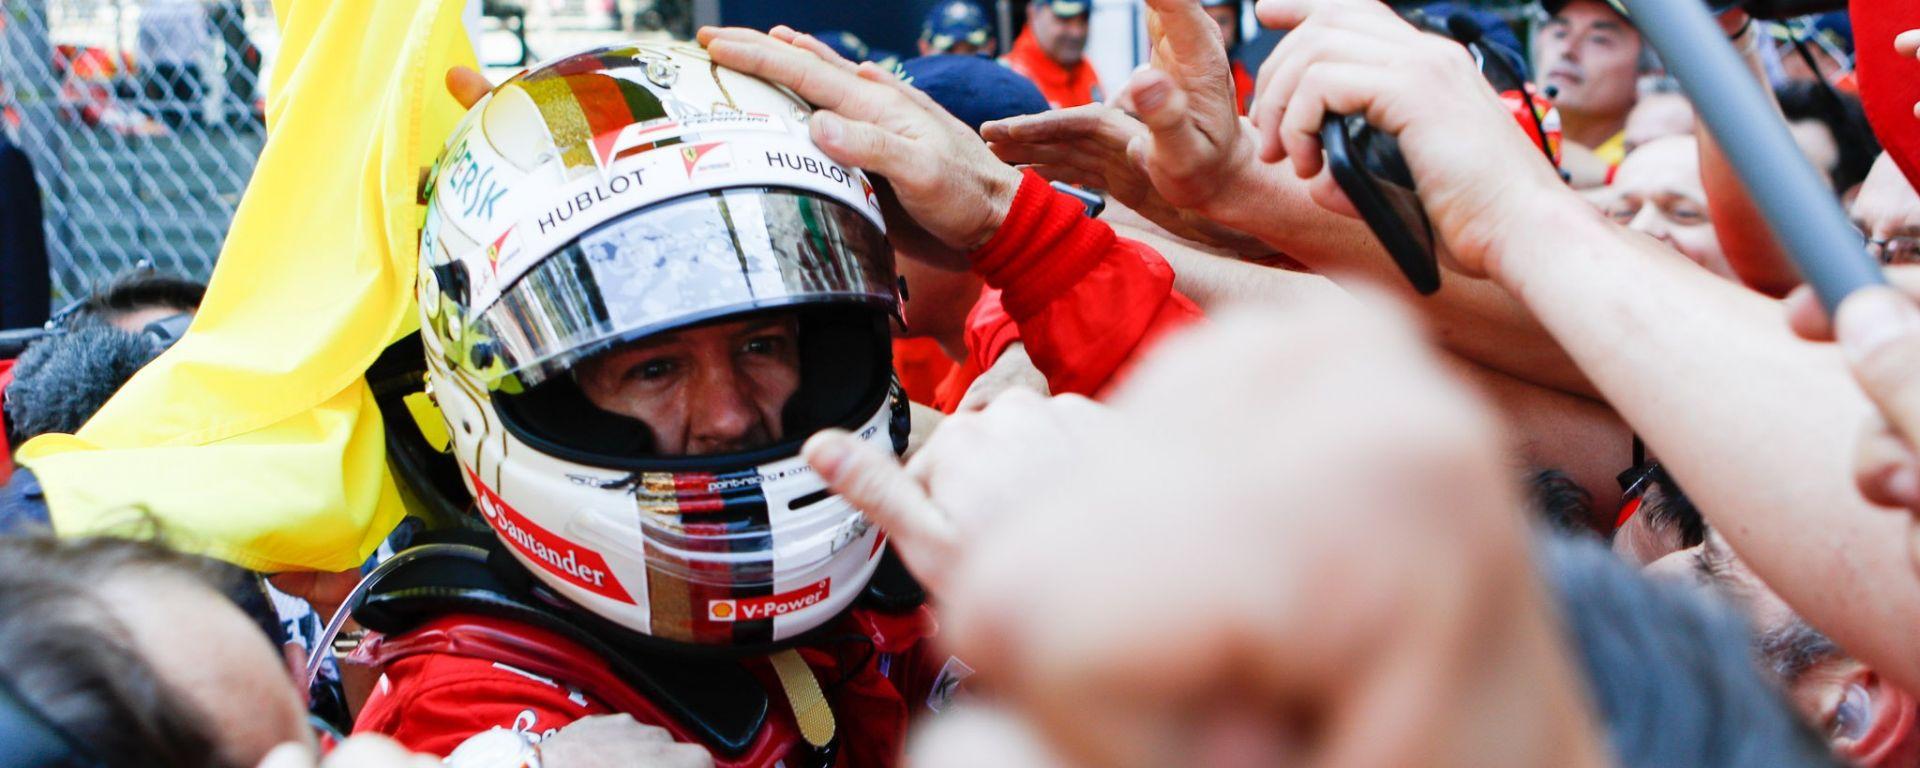 Sebastian Vettel winner - F1 2017 GP Monaco